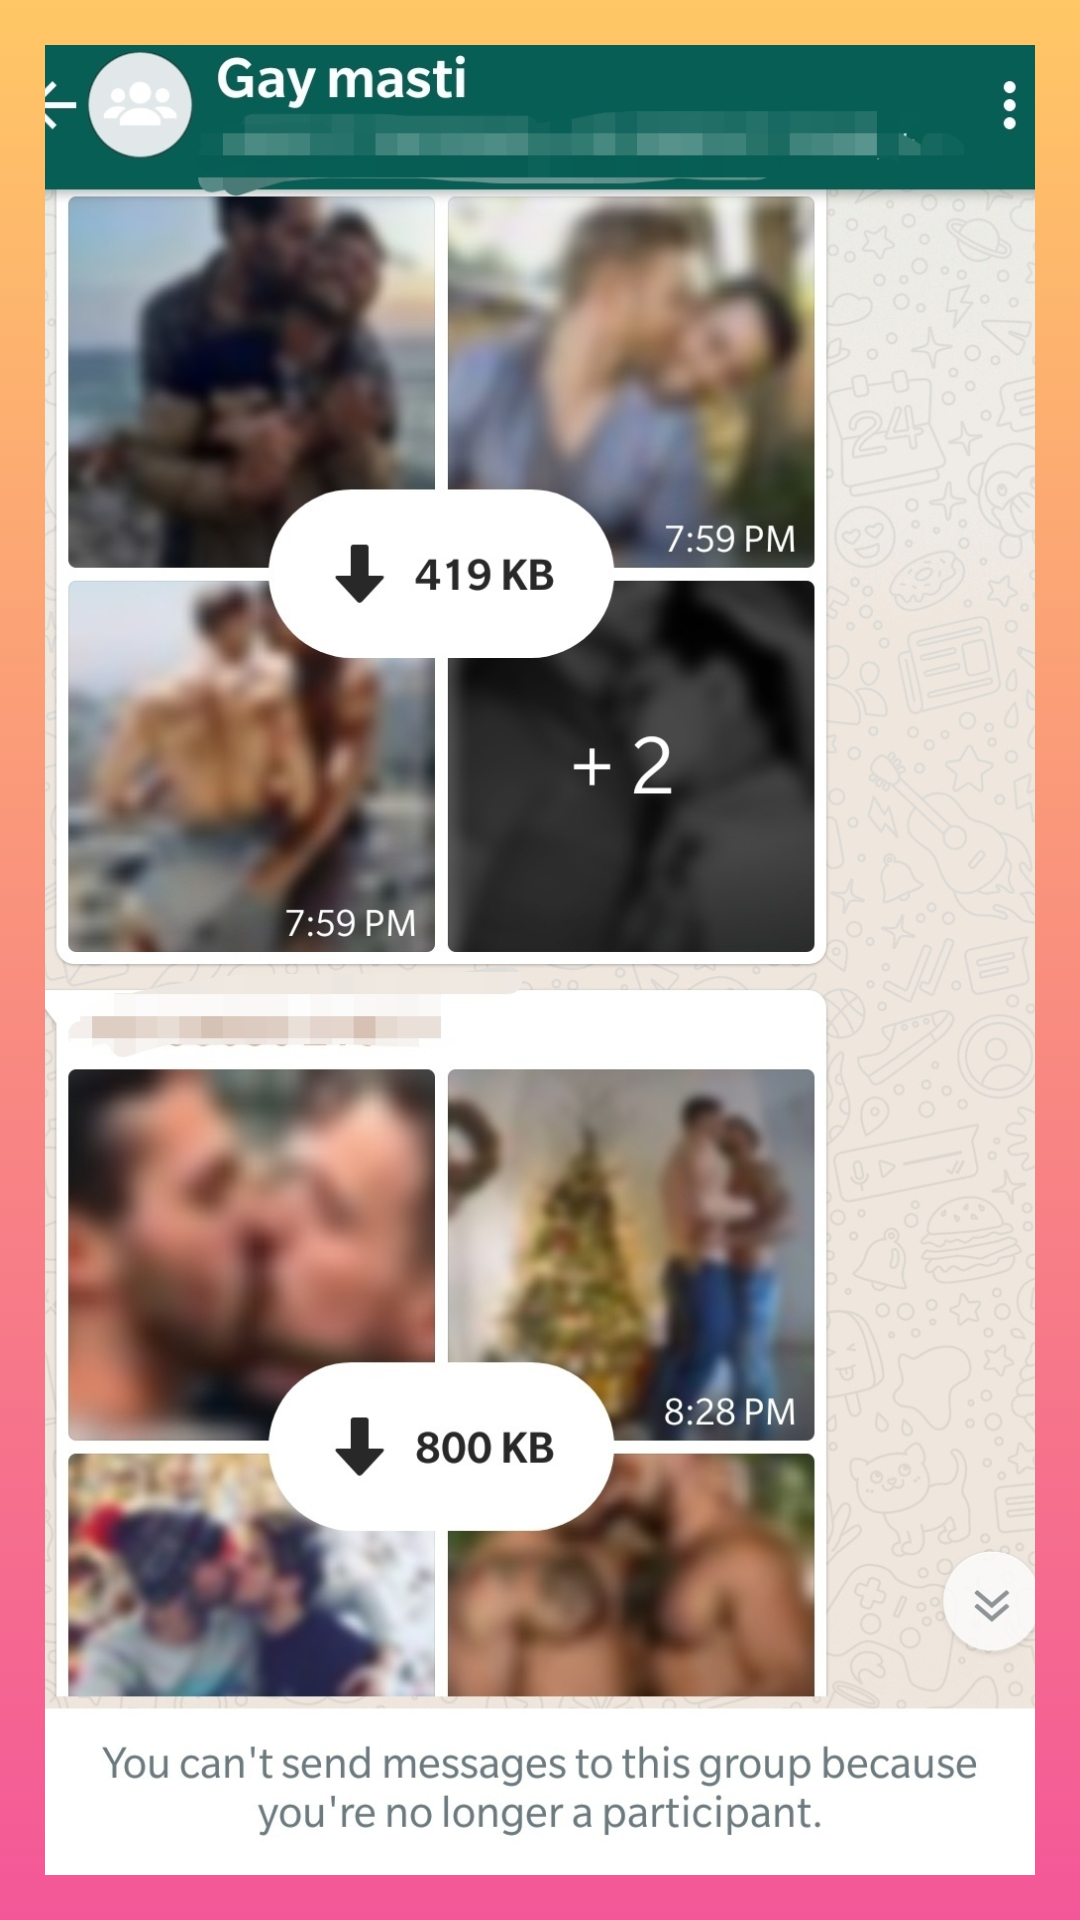 bøsse norway dating video chat